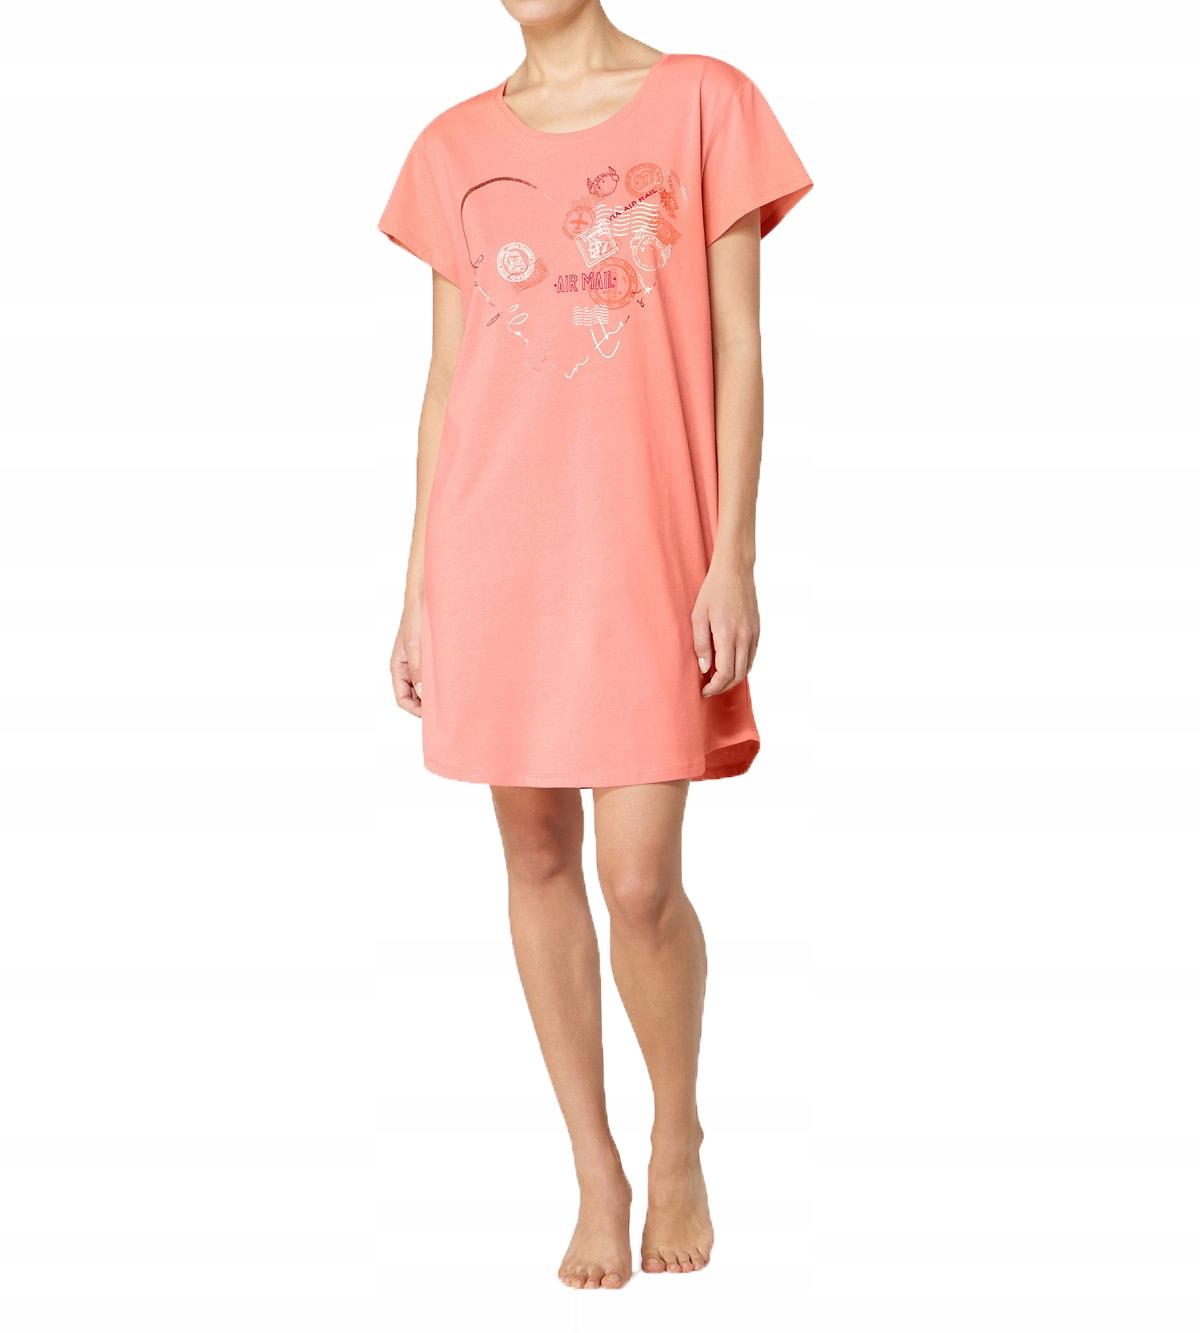 d9bc1183088408 Triumph Nightdresses koszula nocna z nadrukiem 36 - 7183228292 ...